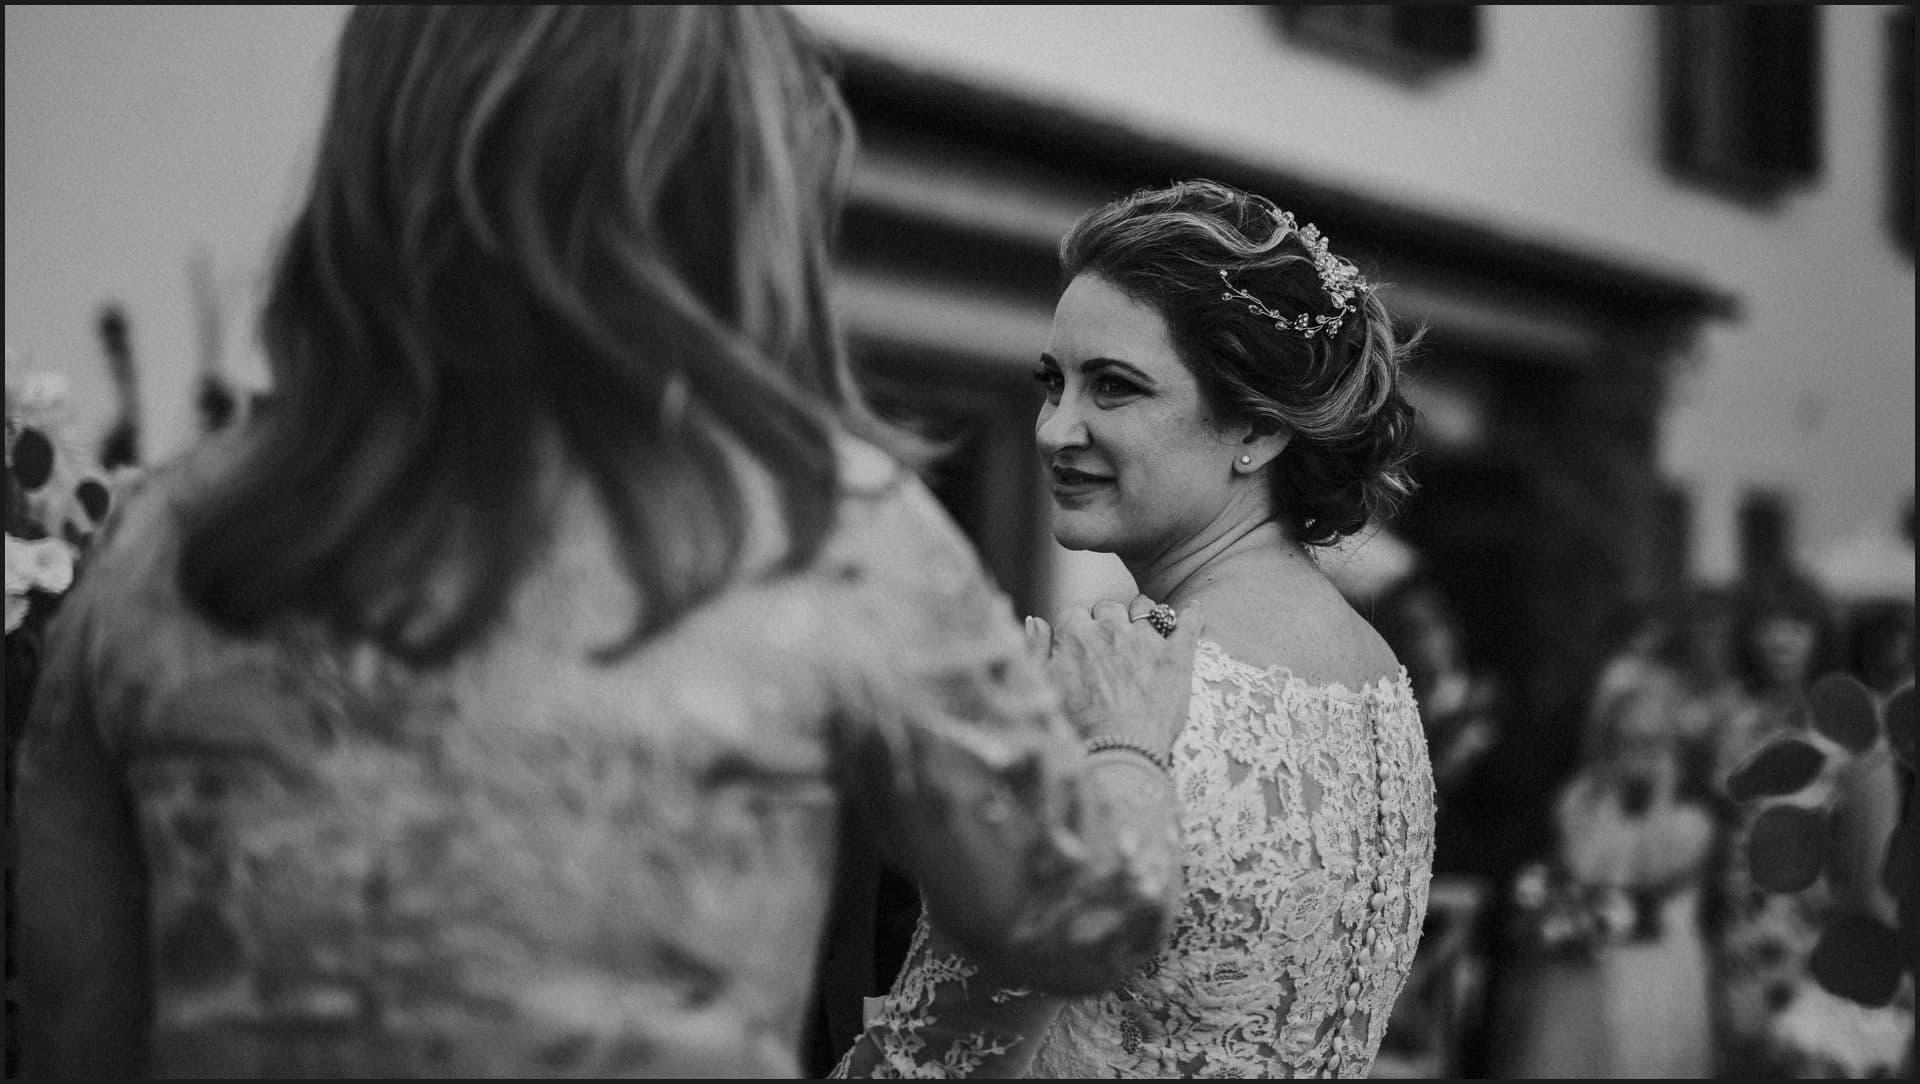 tuscany, destination wedding, chianti, wedding ceremony, bride, black and white